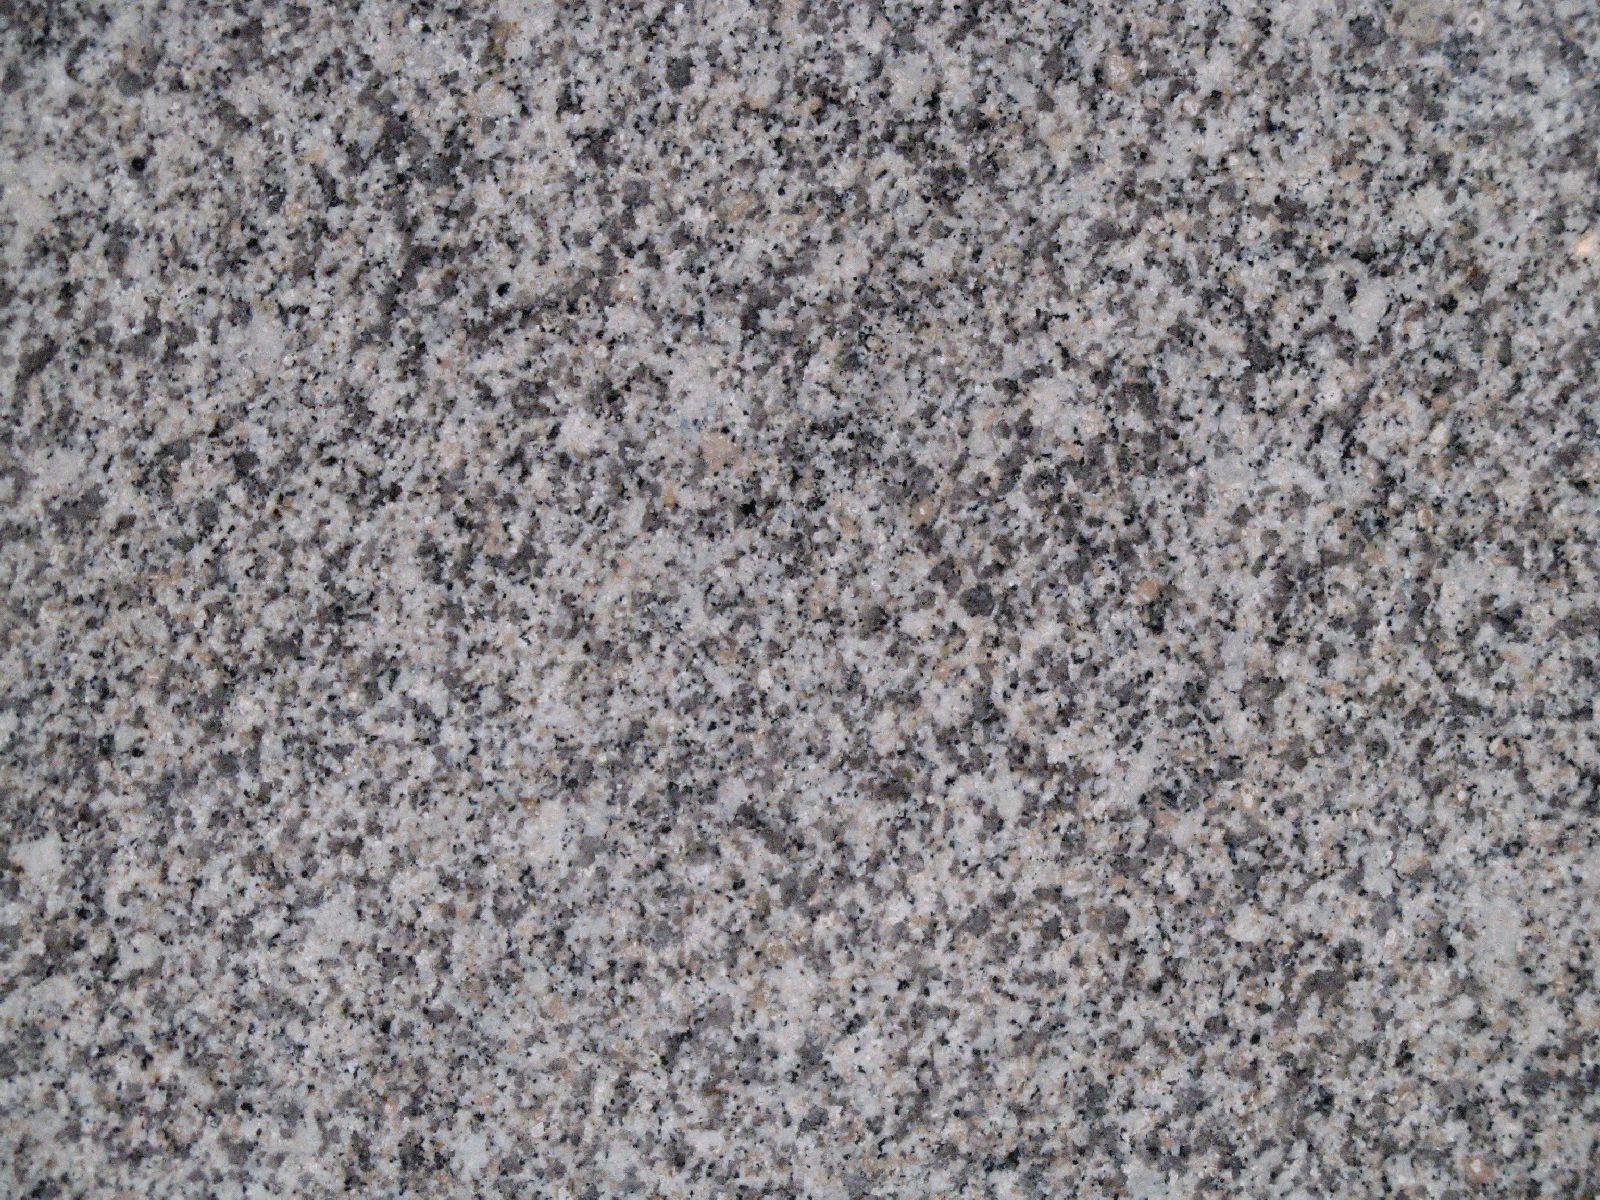 Stone_Texture_B_04002